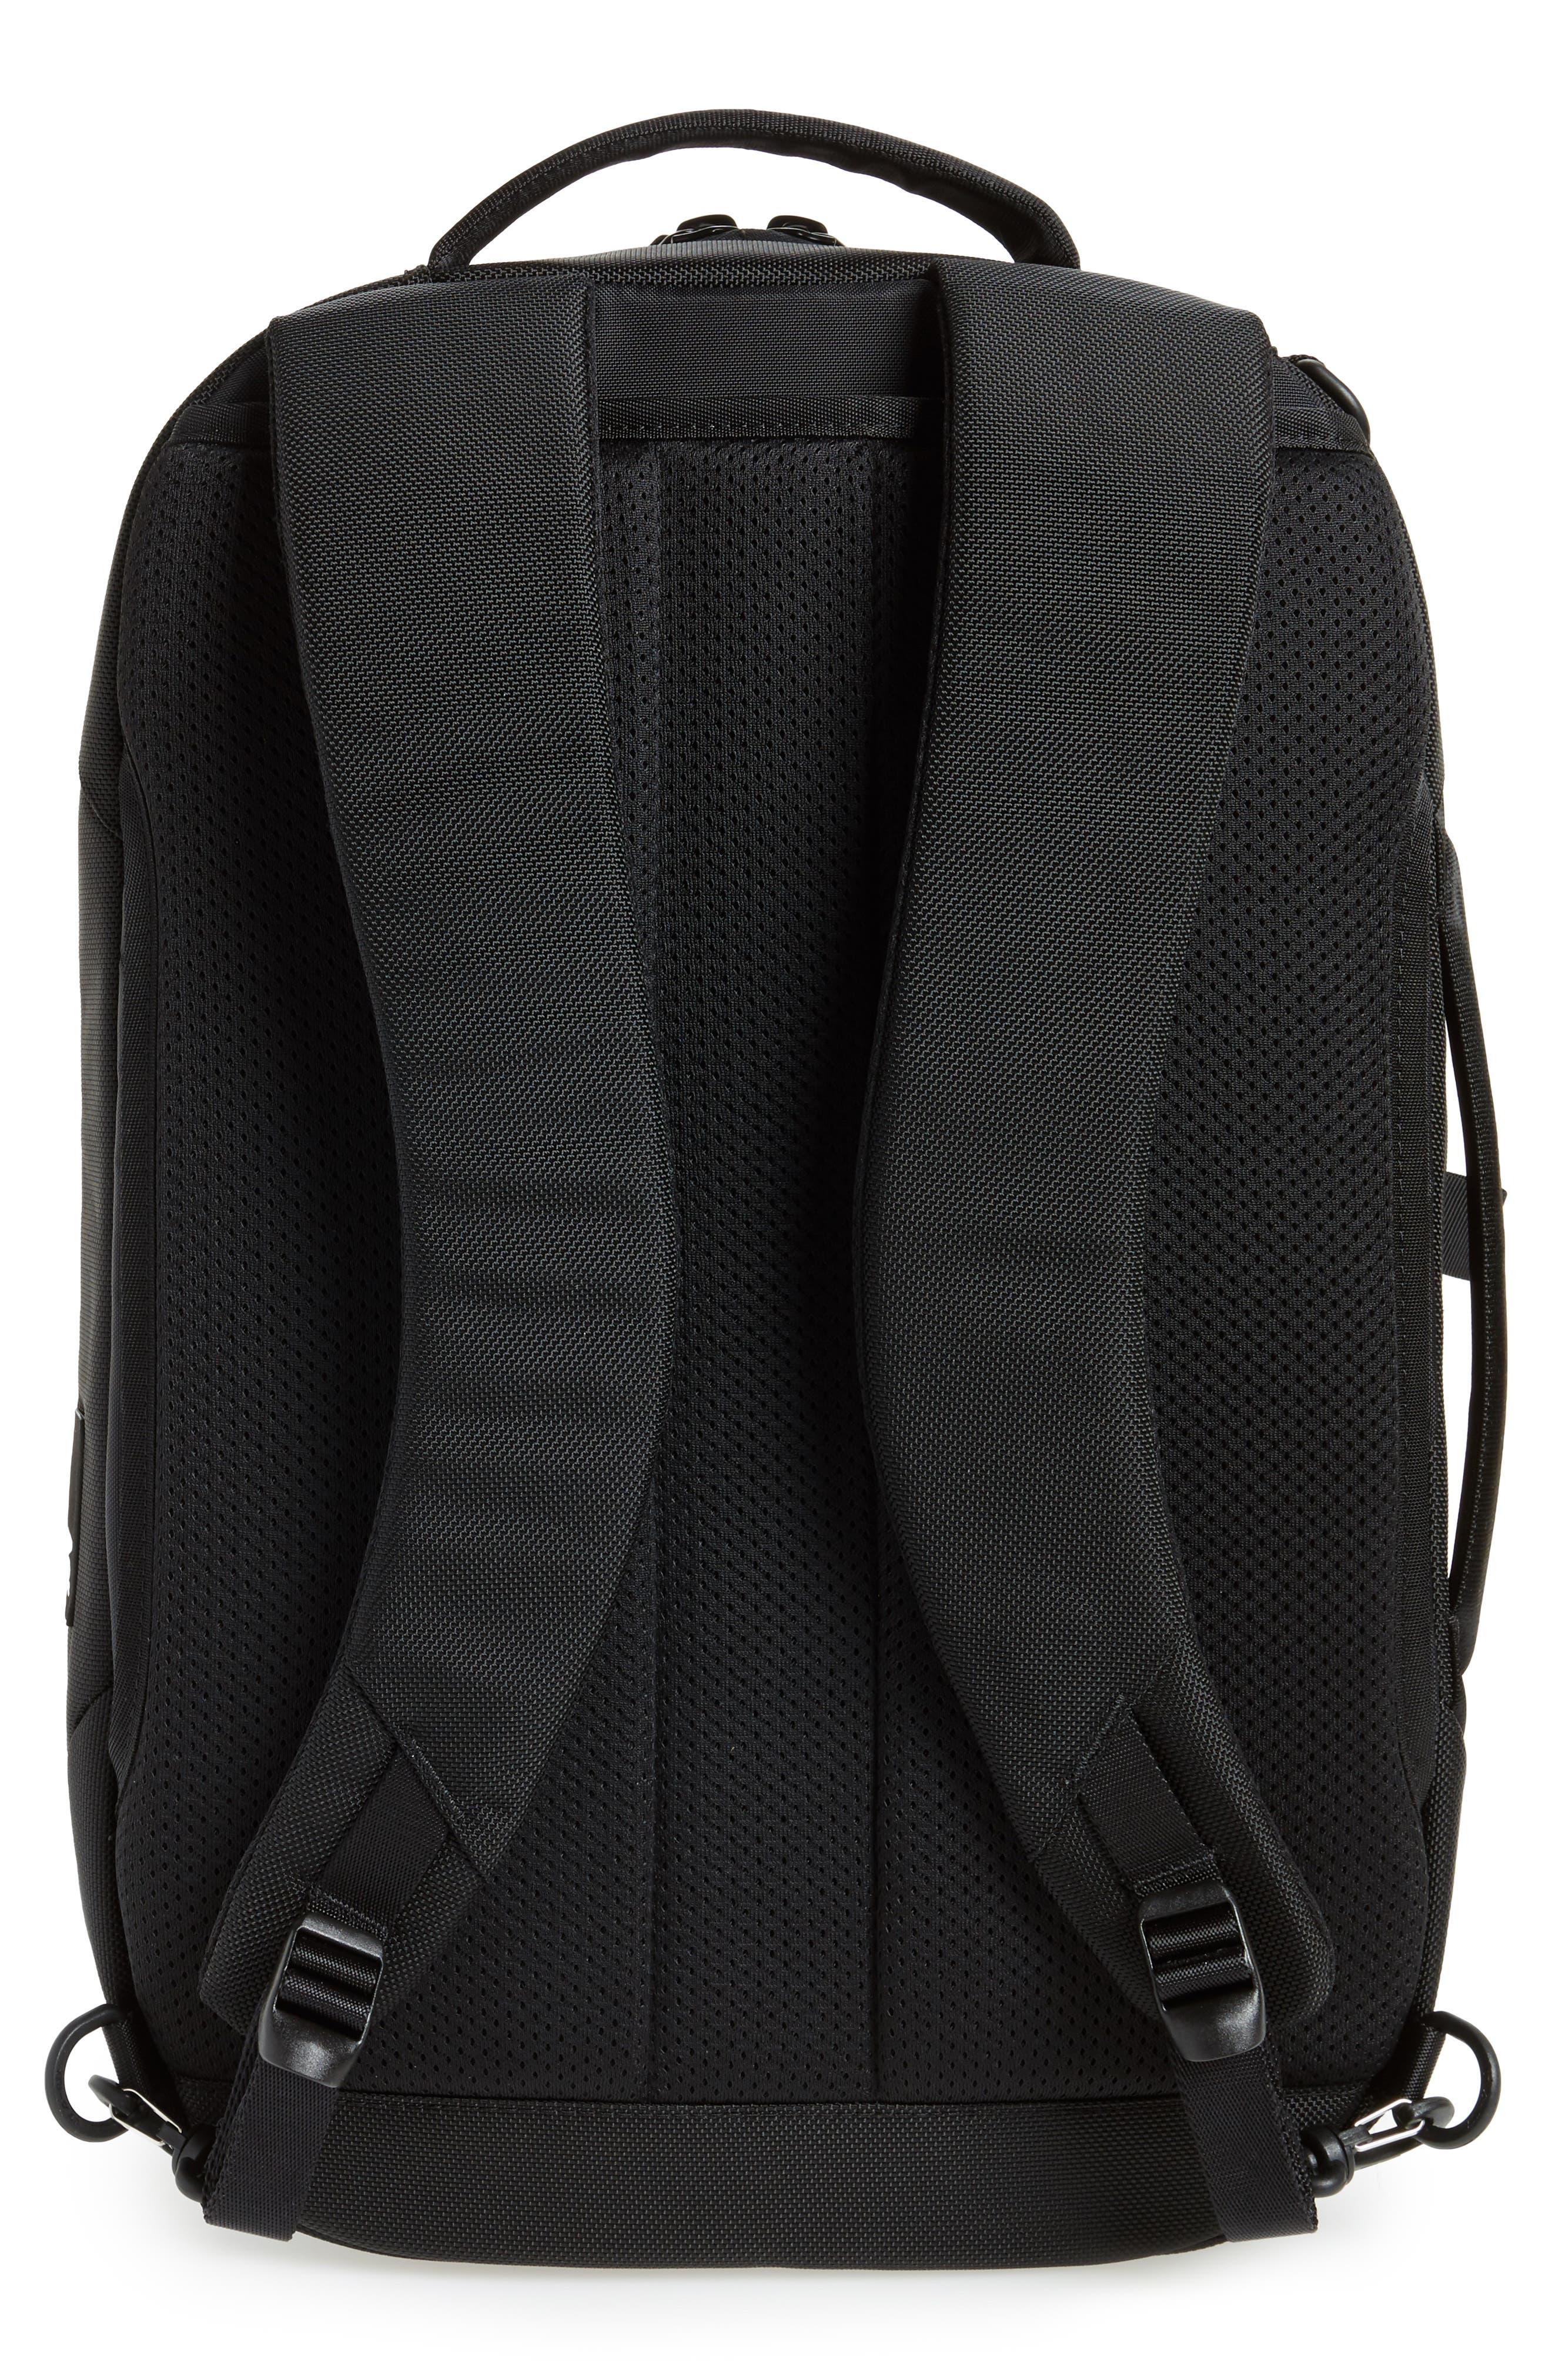 Flight Pack Backpack,                             Alternate thumbnail 4, color,                             001